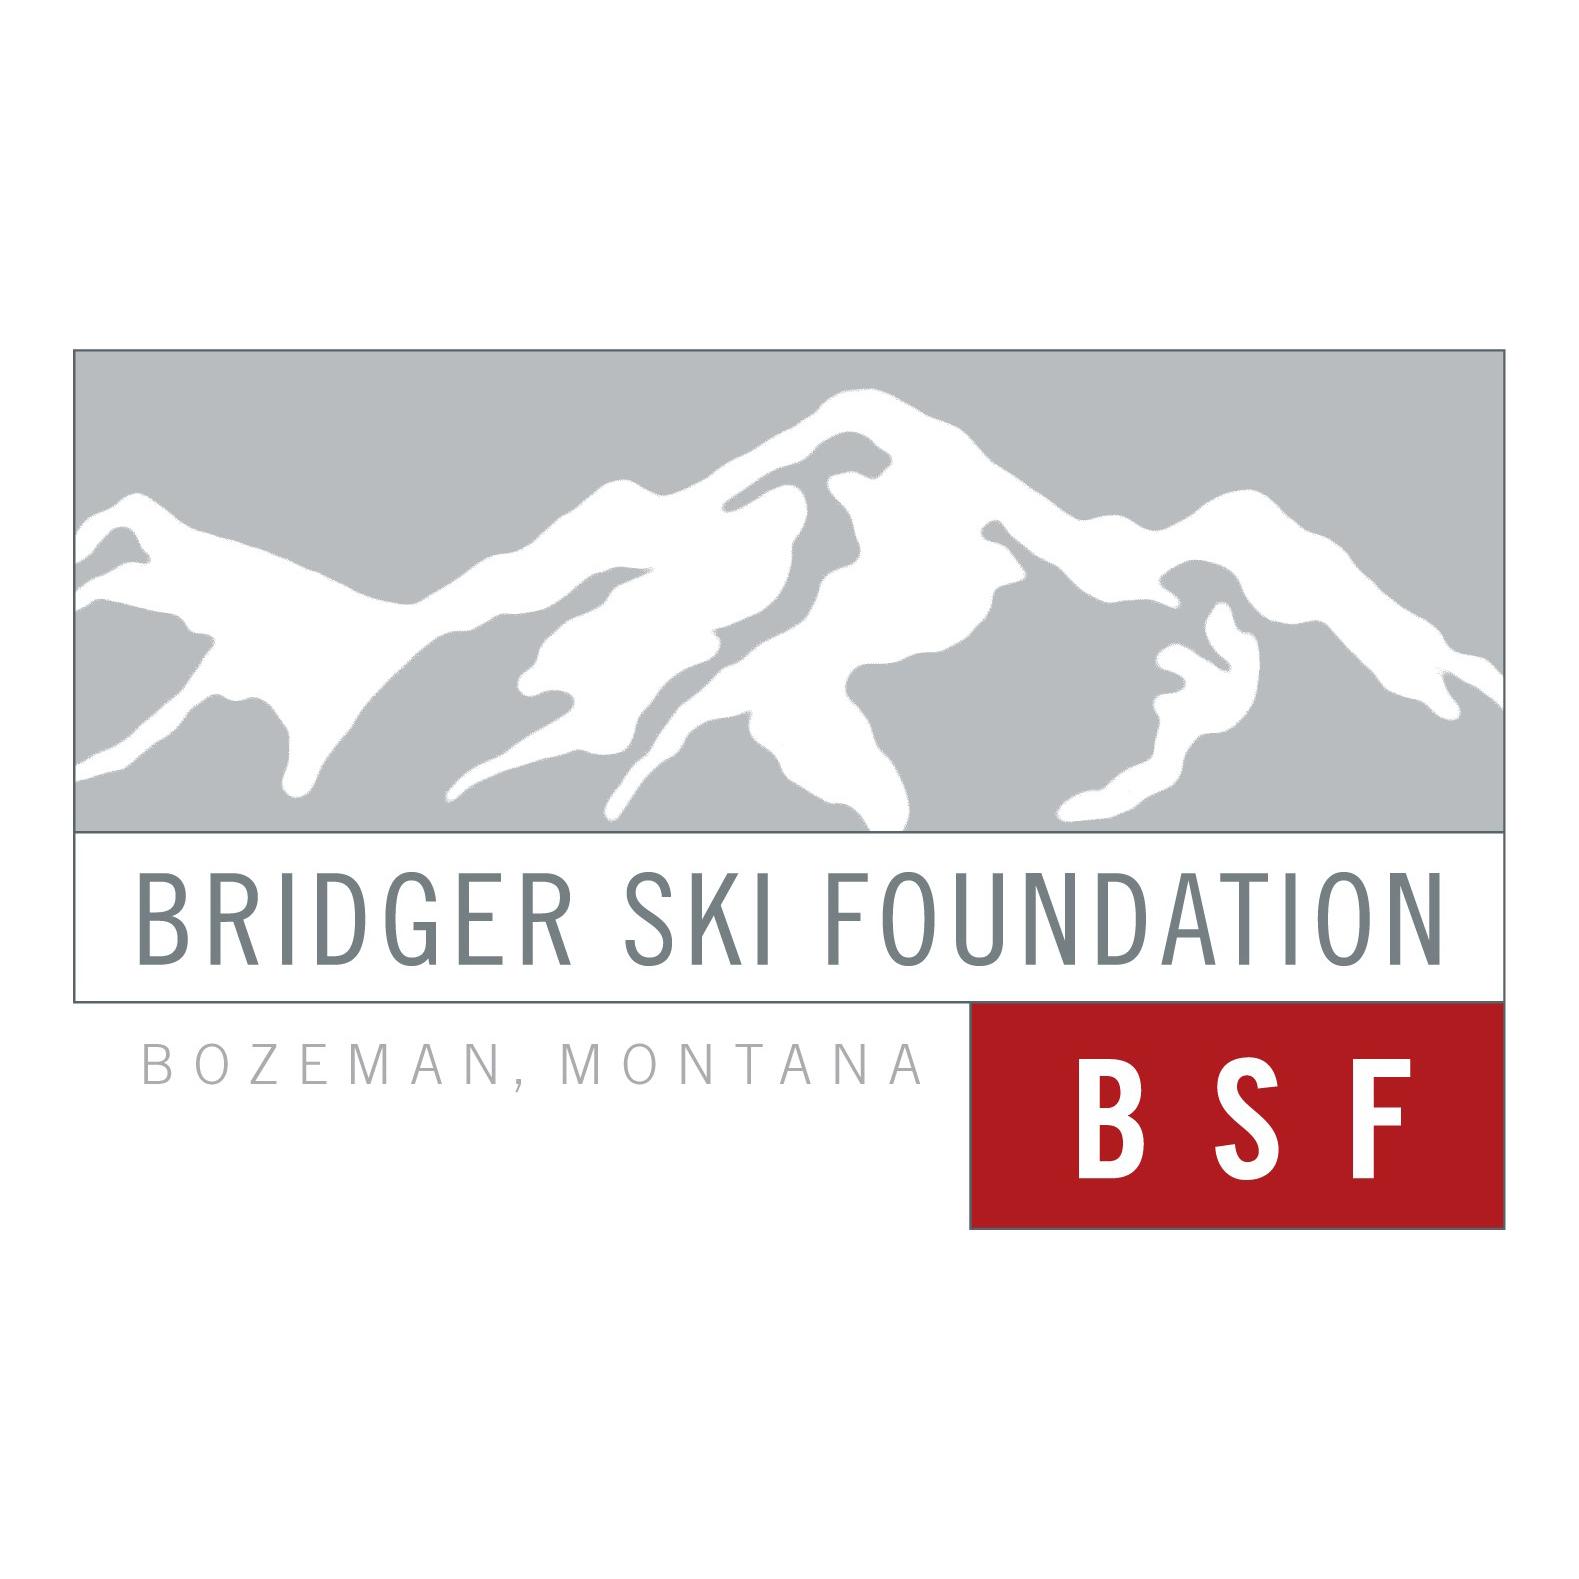 Bridger Ski Foundation